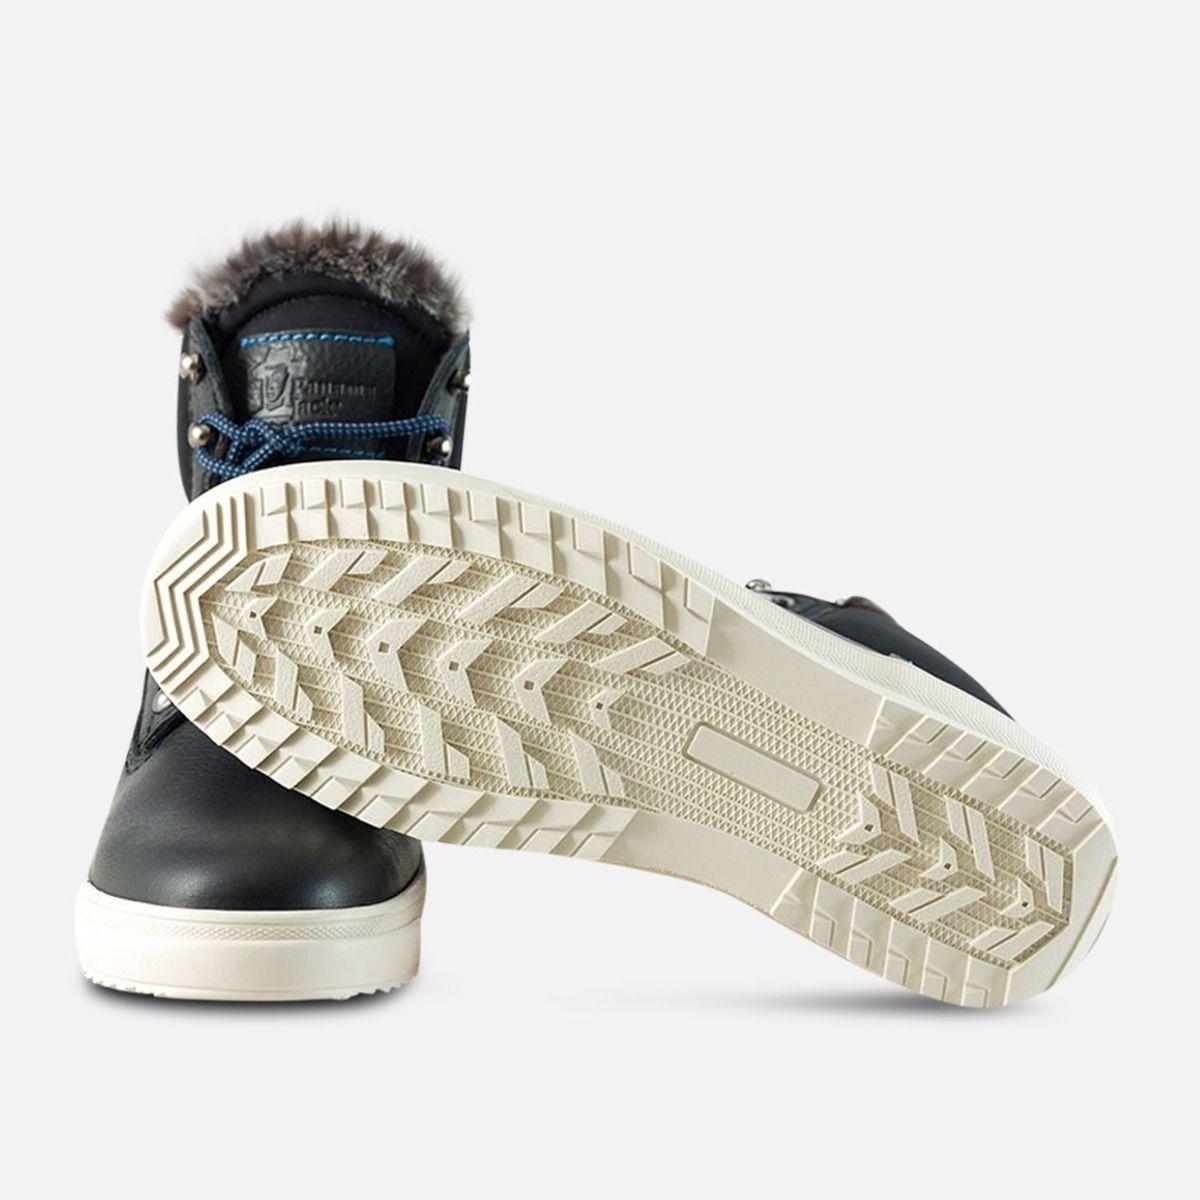 Fur Lined Black Urban Trekker by Panama Jack Shoes